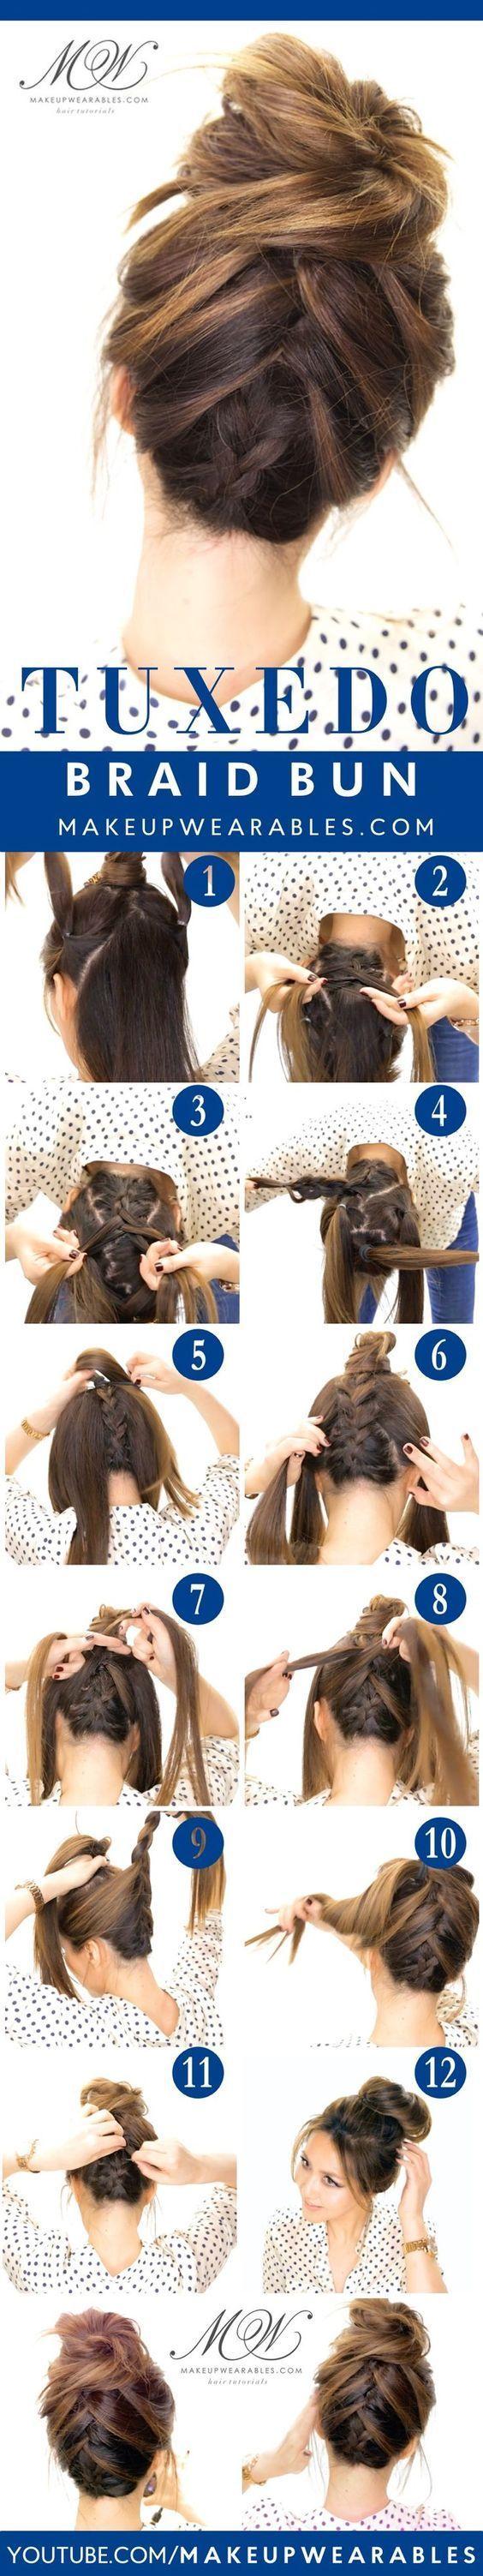 Tuxedo Braid Bun Tutorial   5 Messy Updos for Long Hair, check it out at http://makeuptutorials.com/updos-for-long-hair-makeup-tutorials